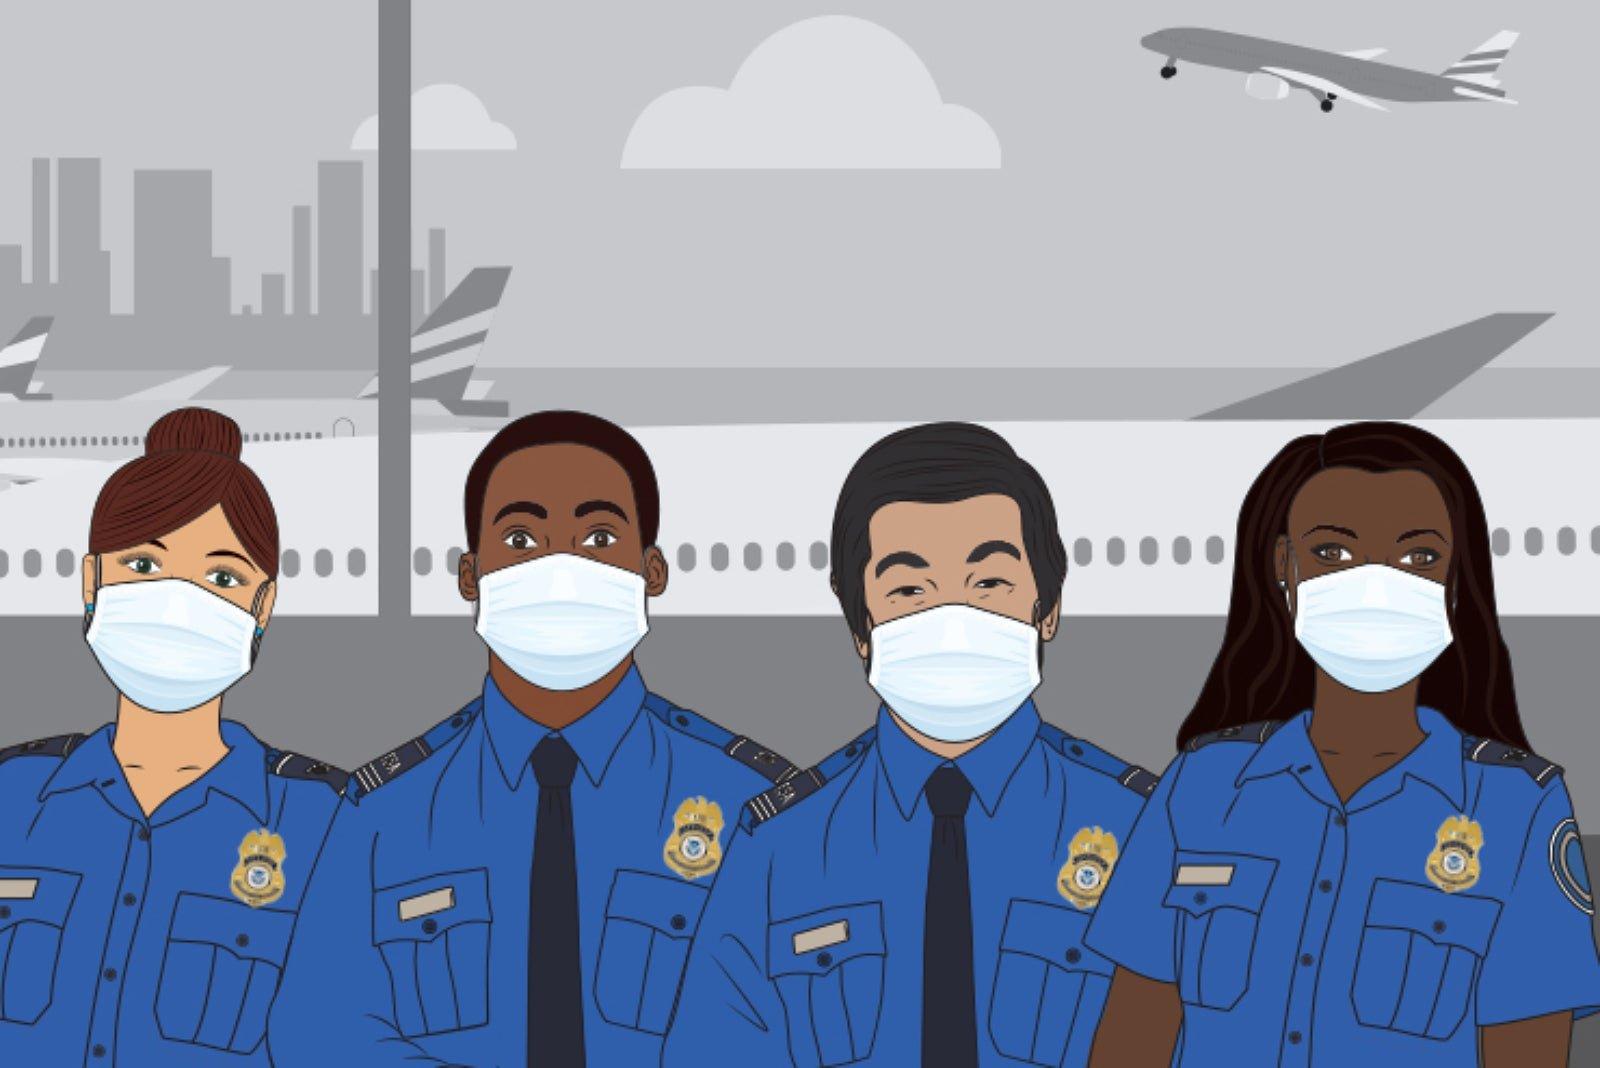 Busy summer? TSA says it needs 6,000 new officers to meet skyrocketing travel demand